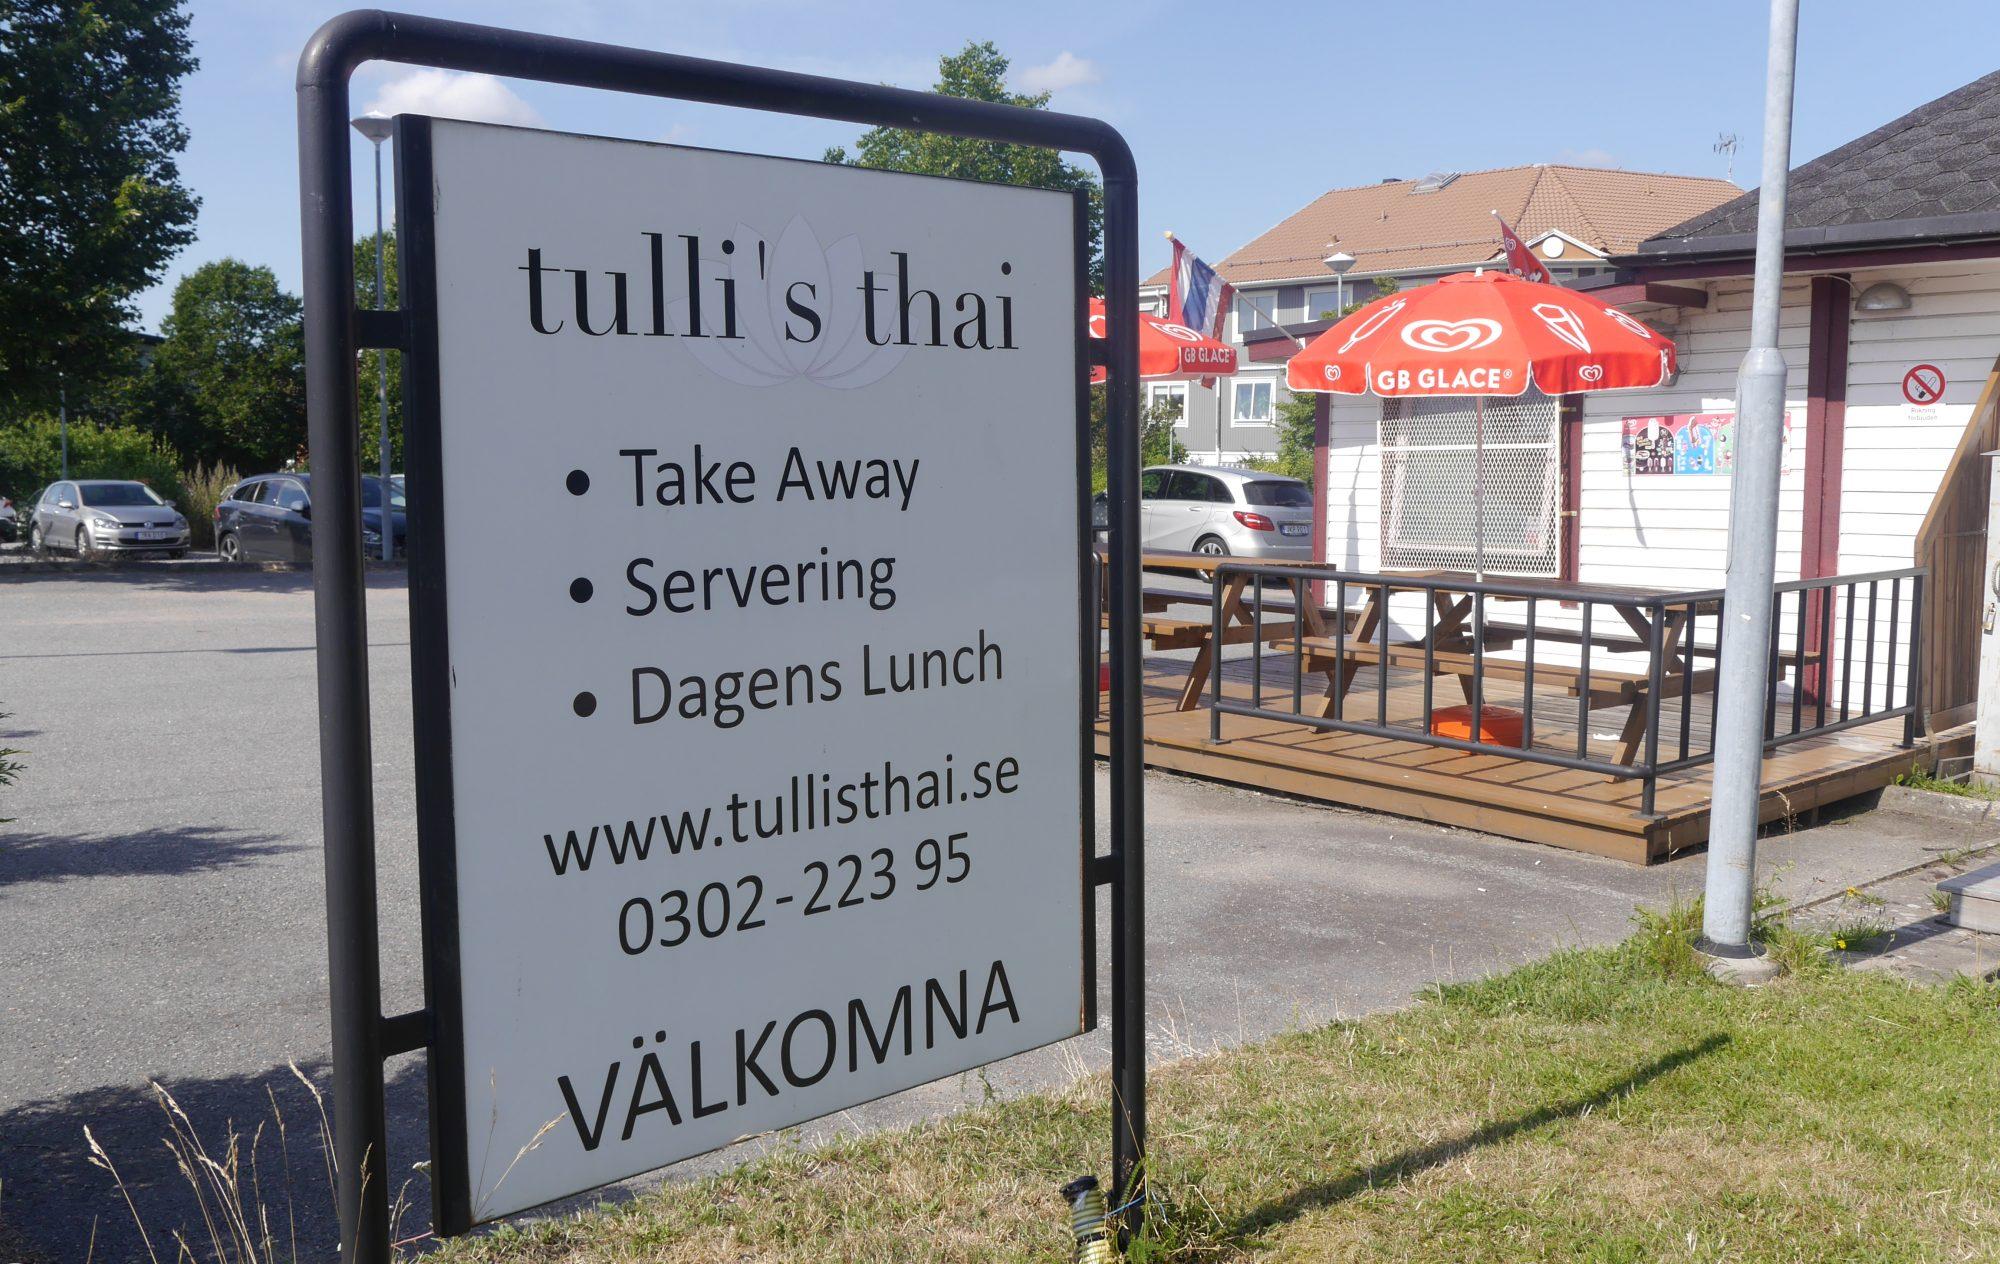 Tulli's Thai